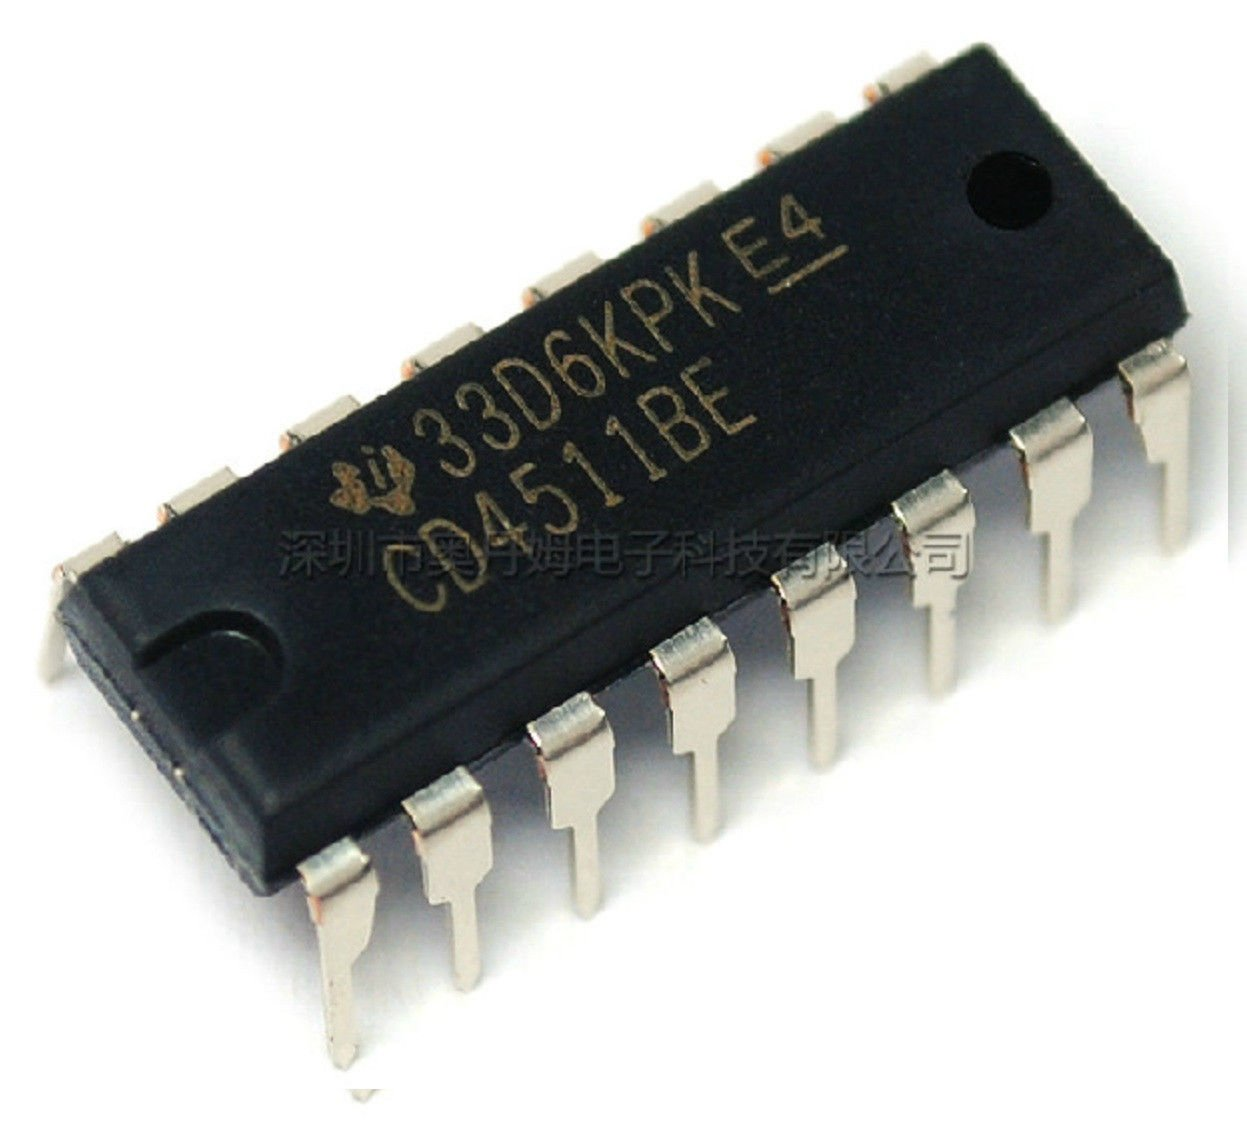 Exiron 100pcs CD4511 CD4511BE 4511 CMOS BCD to 7 segment Latch Decoder IC